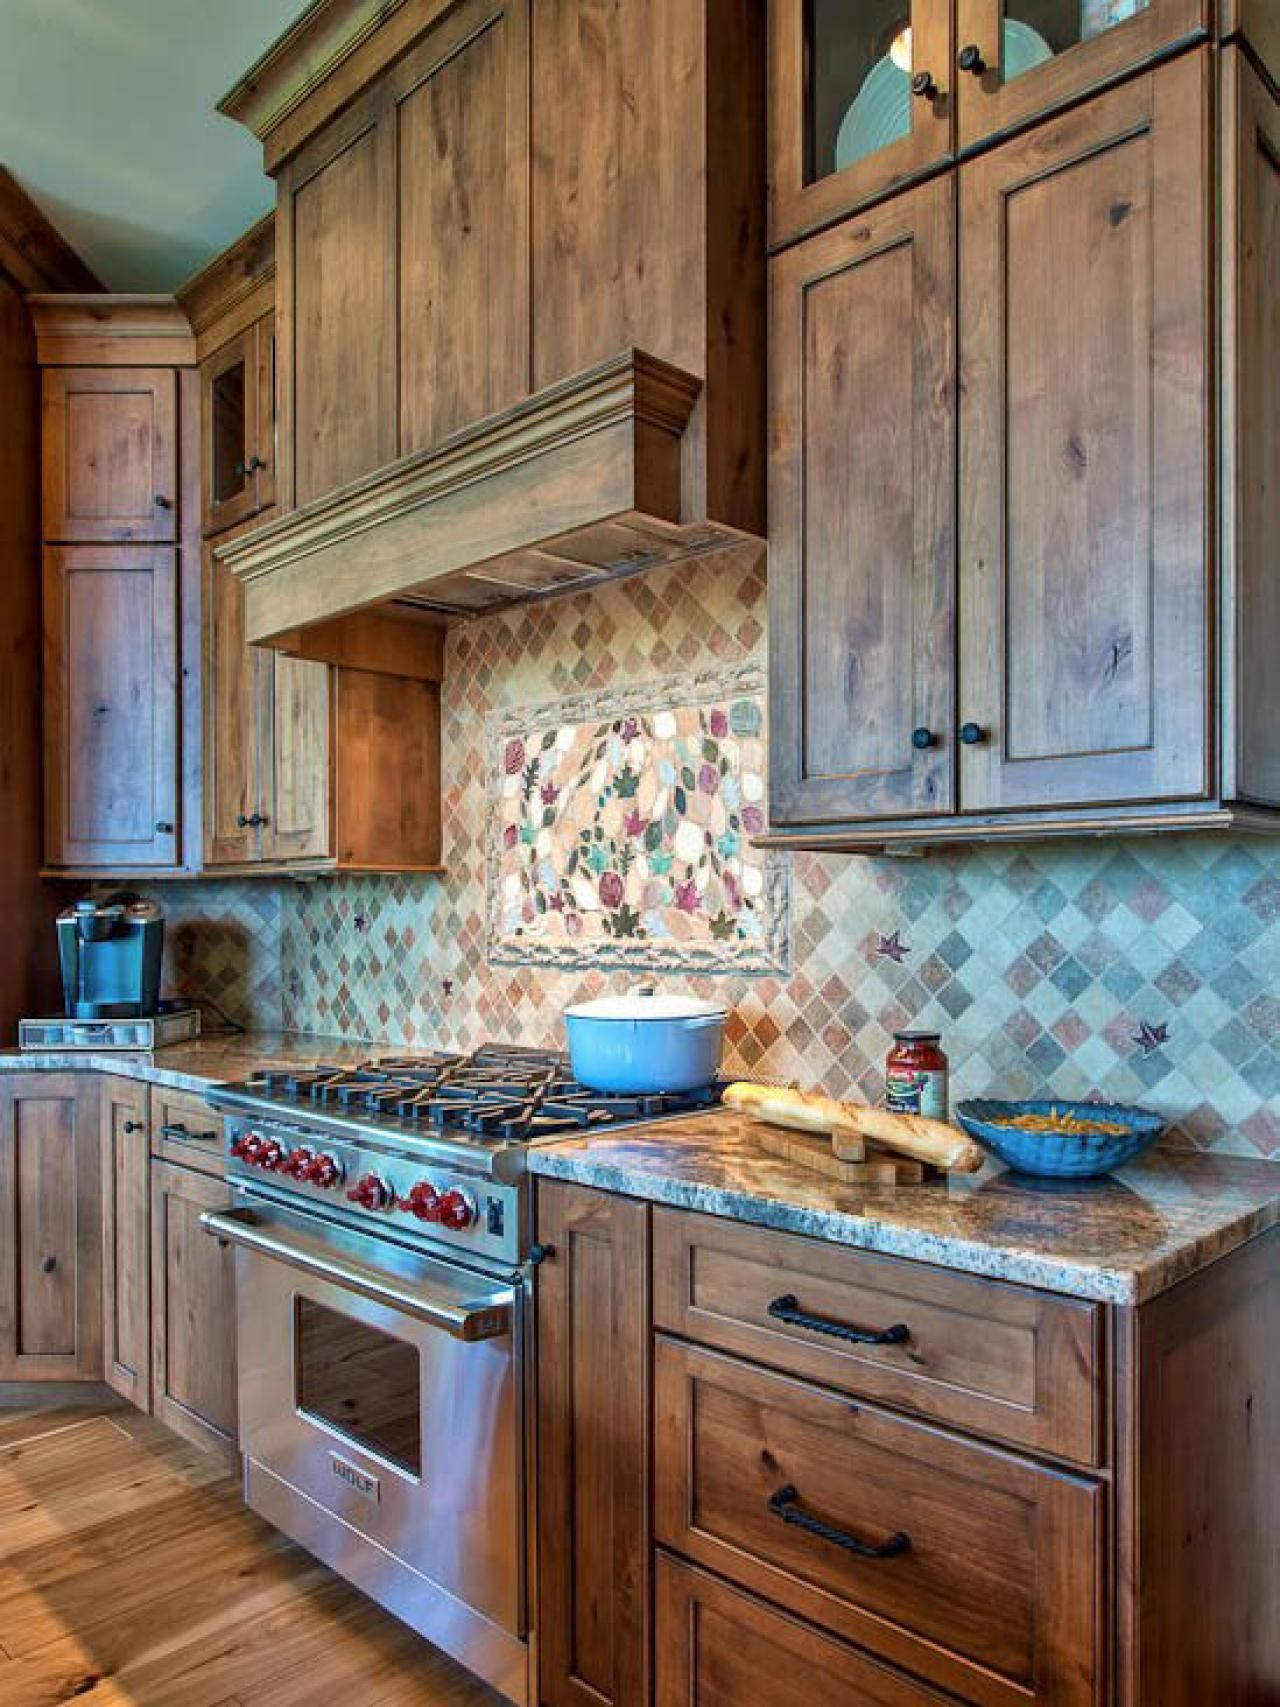 Beautiful rustic Rustic kitchen